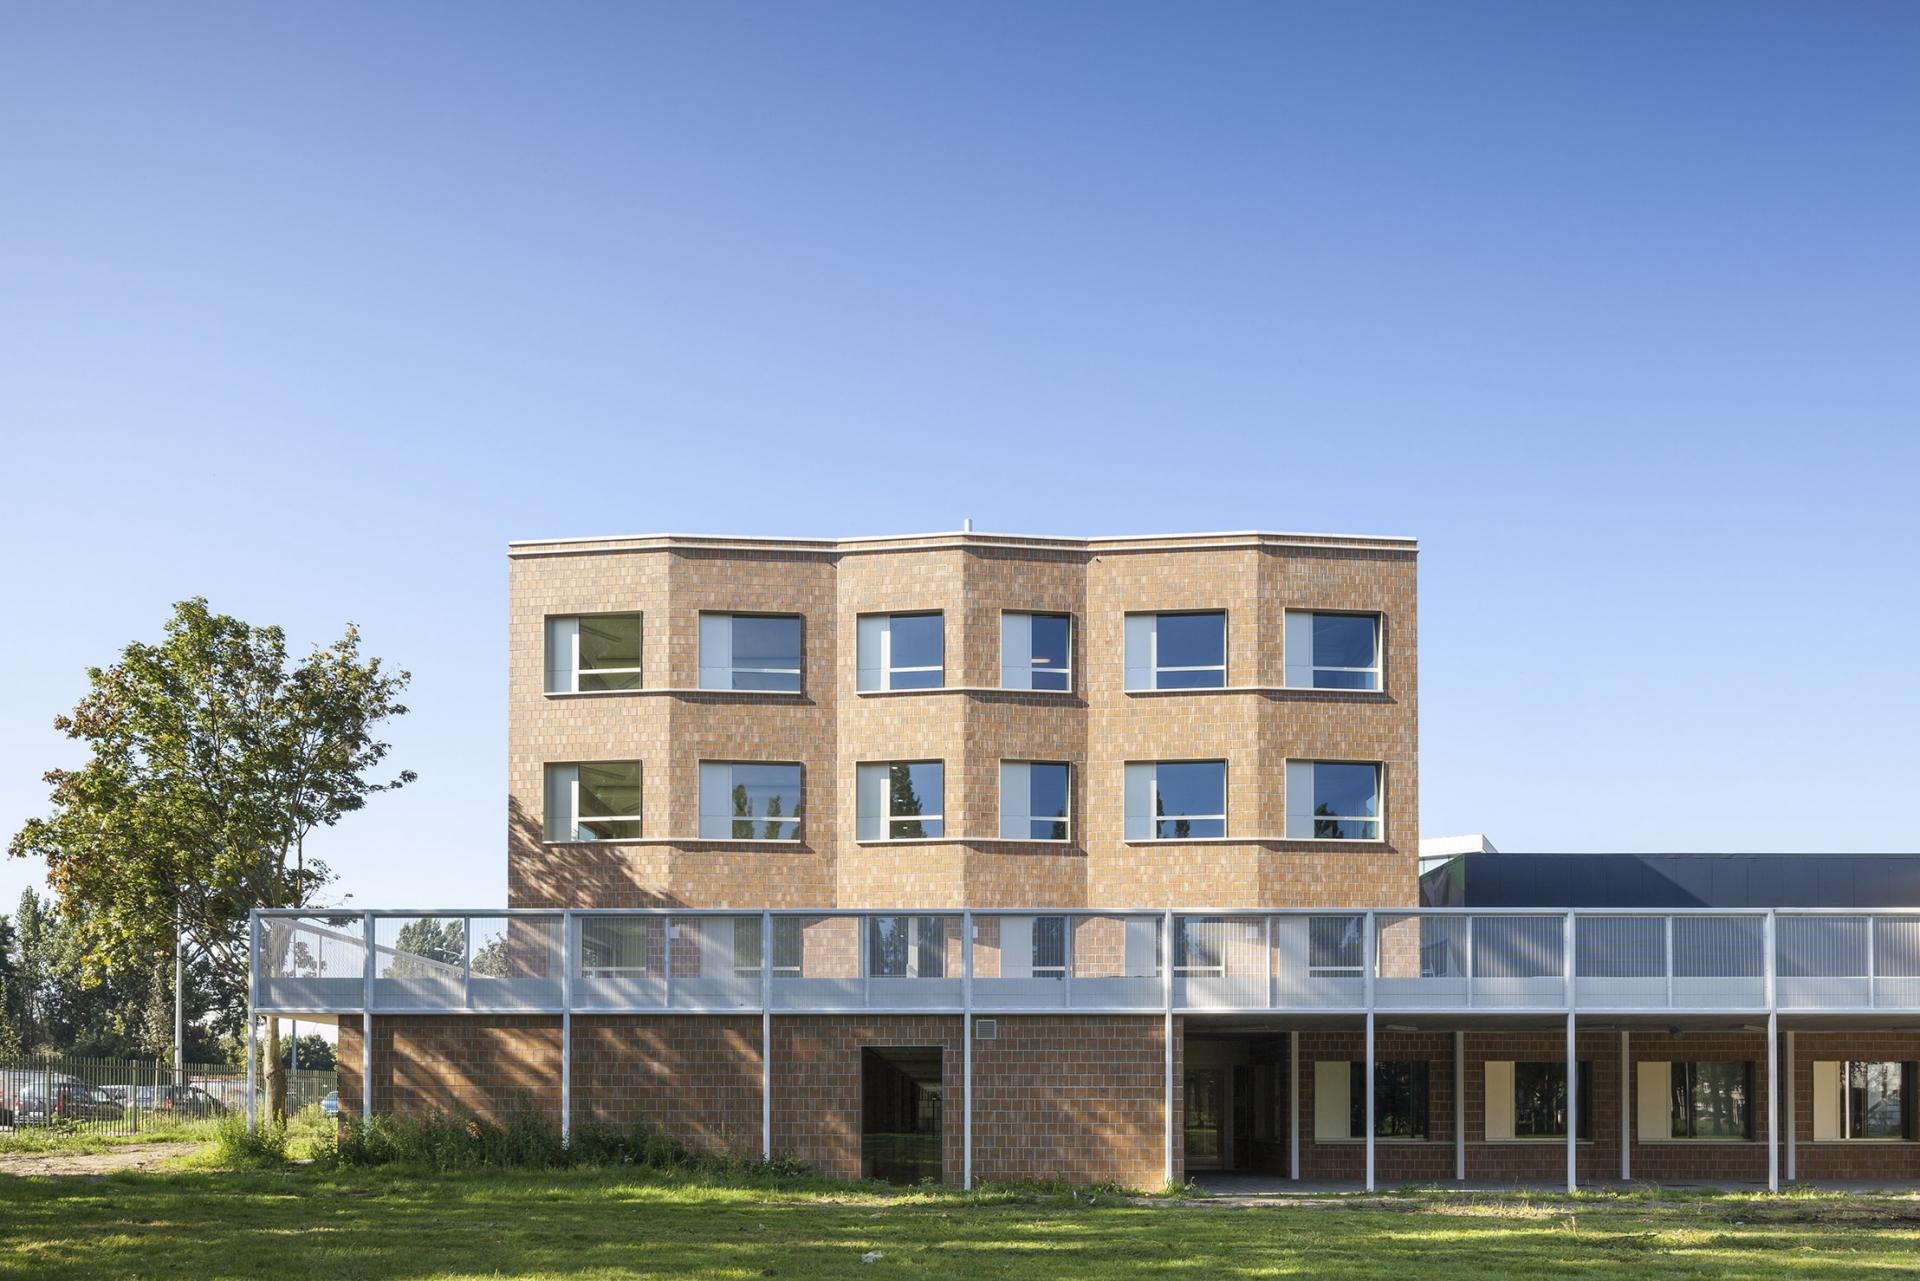 D a freinetschool de kring festival van de architectuur for Dat architecten